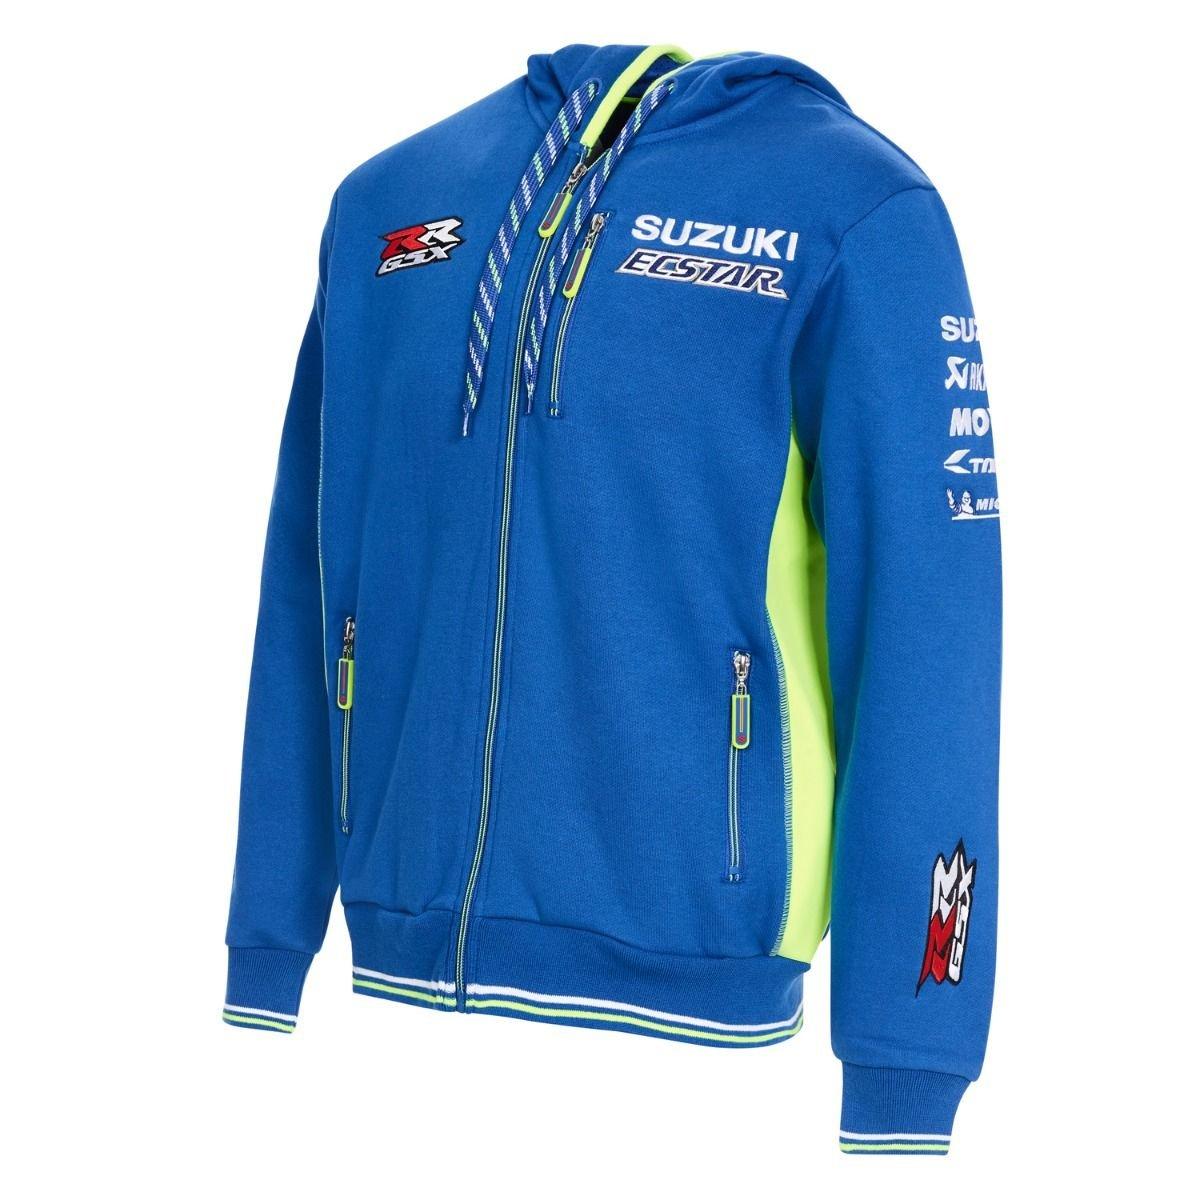 CLINTON ENTERPRISES Mikina Suzuki ECSTAR 2018 - Motostar.cz 3e3b712db98